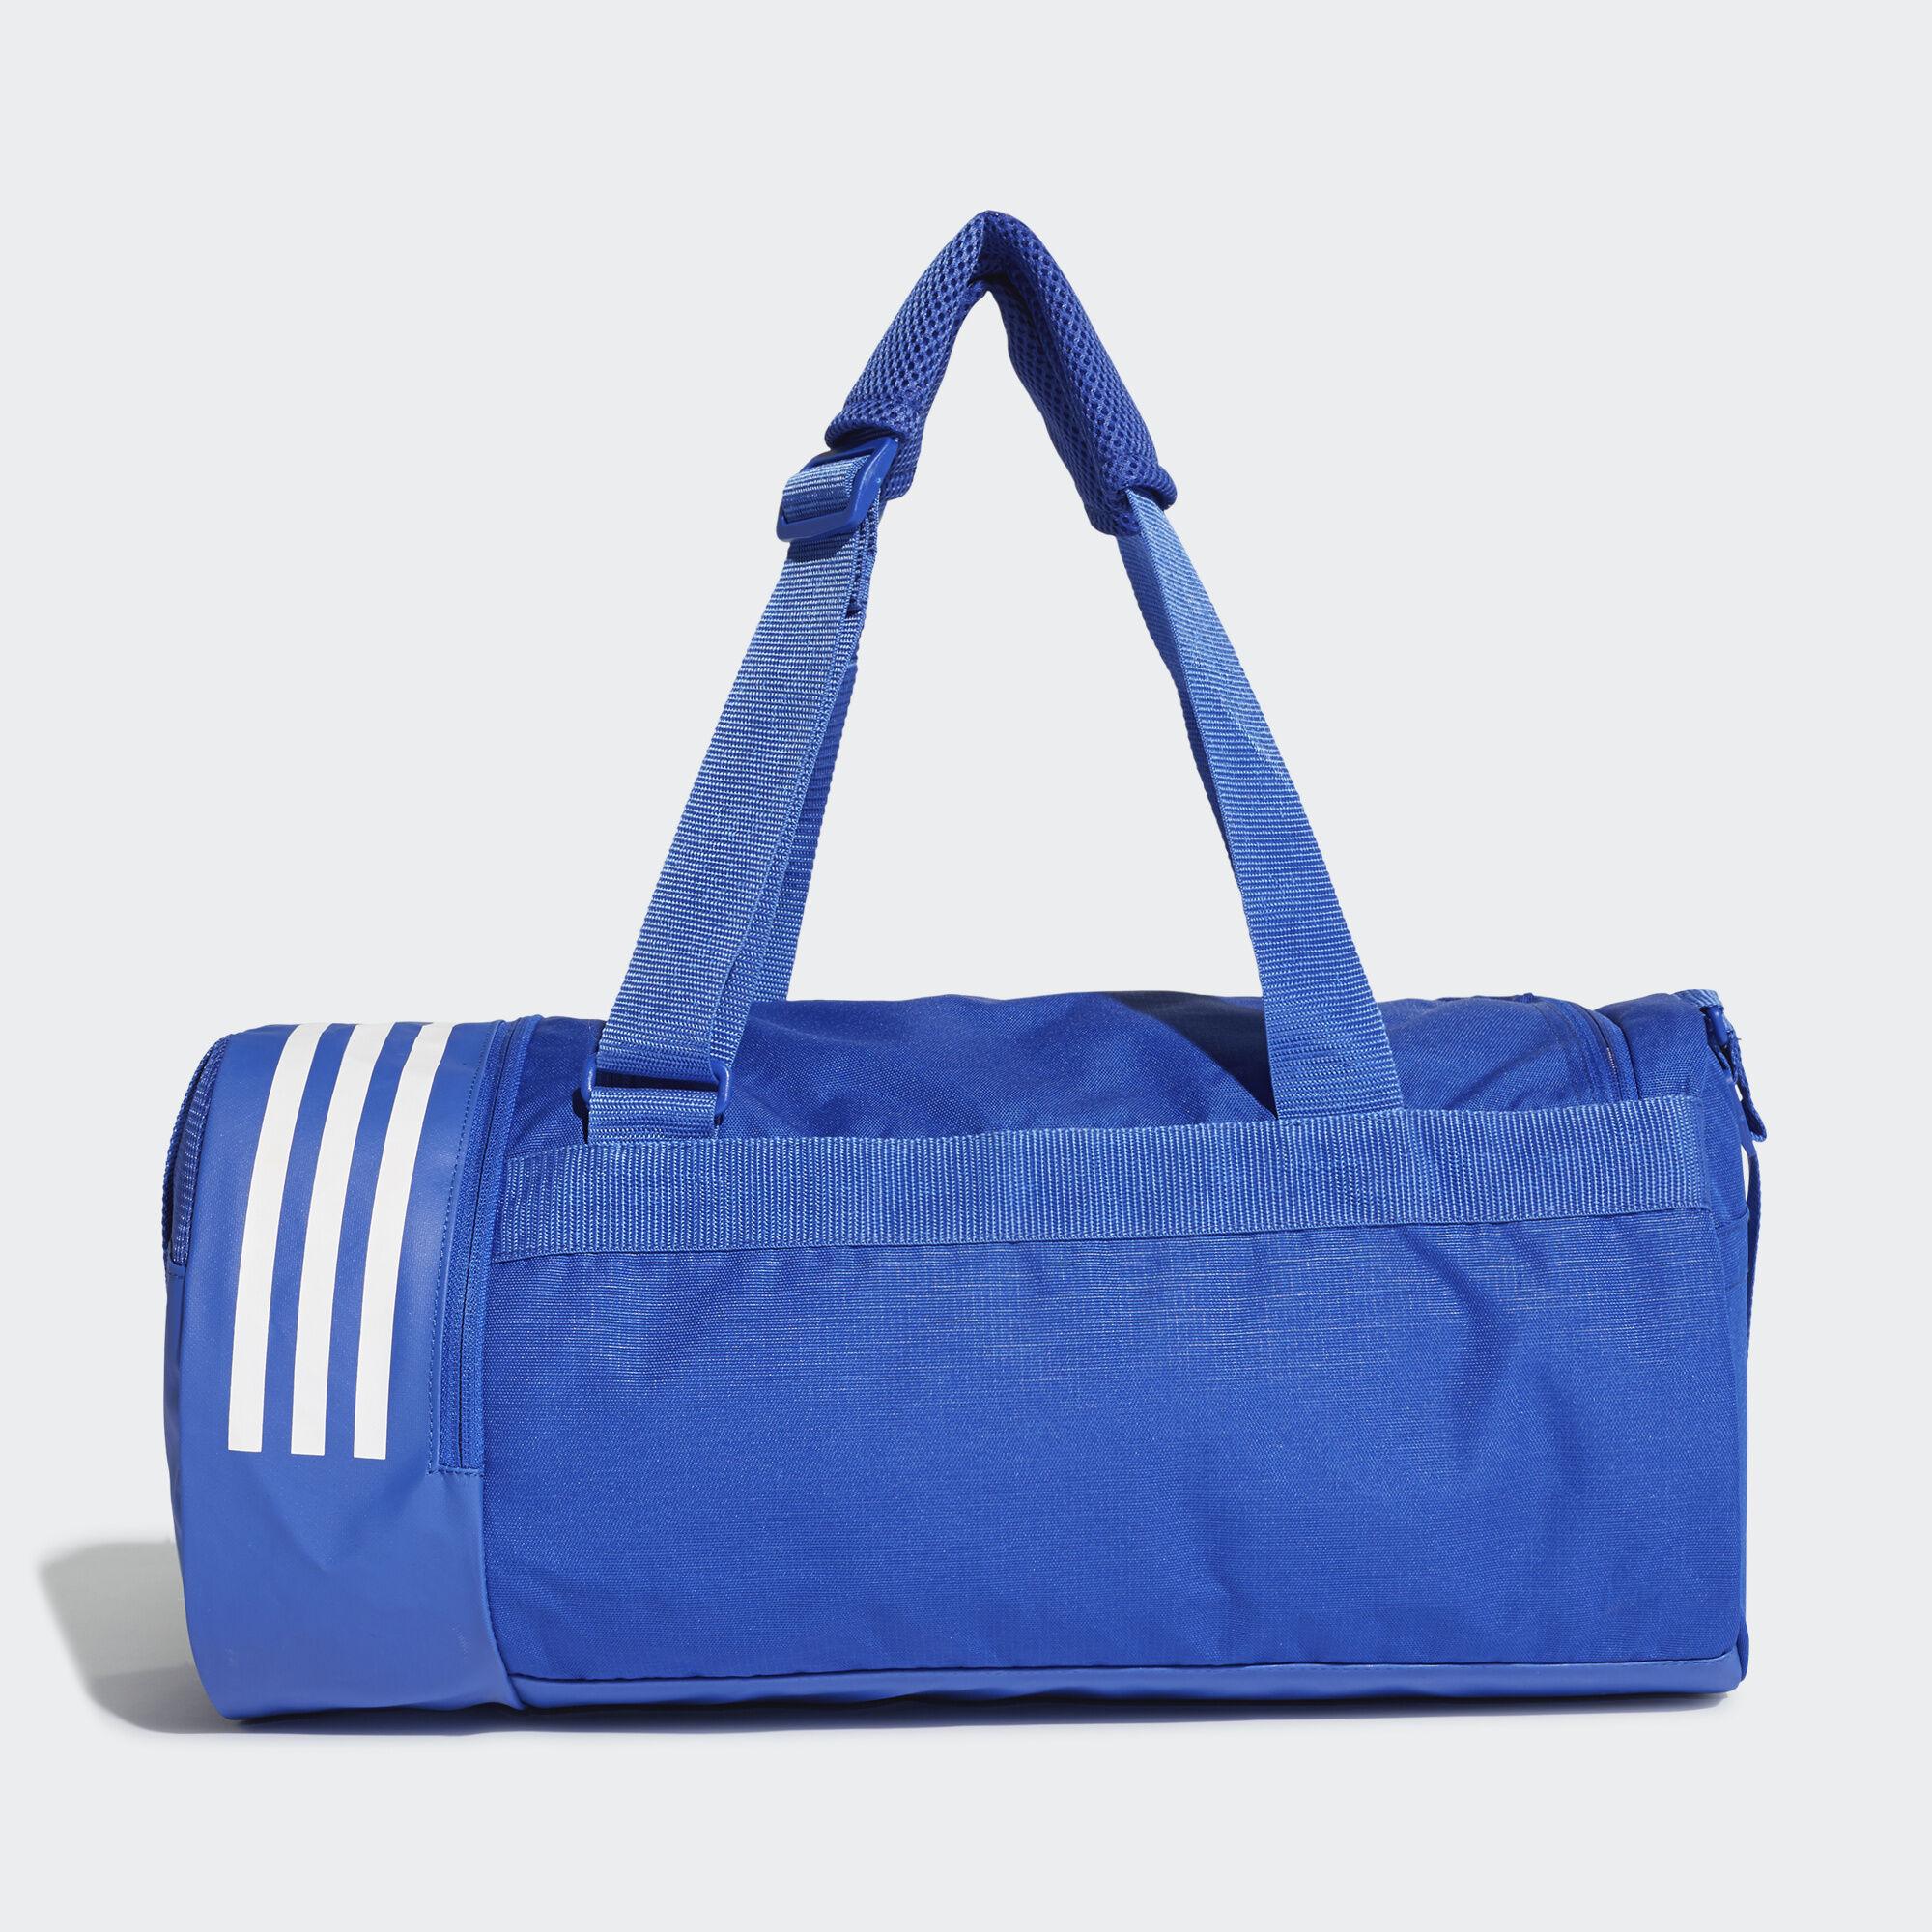 adidas Convertible 3-Stripes Duffel Bag Small - Black  e0457858b43c9